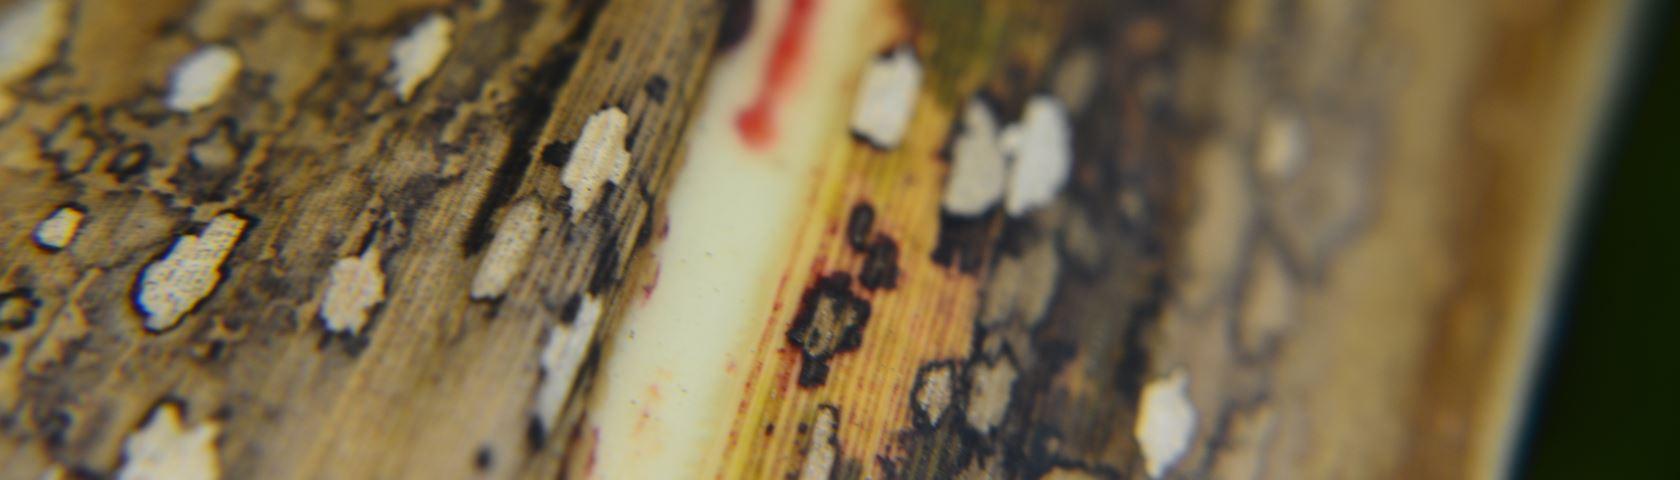 Dried Sugarcane Leaves